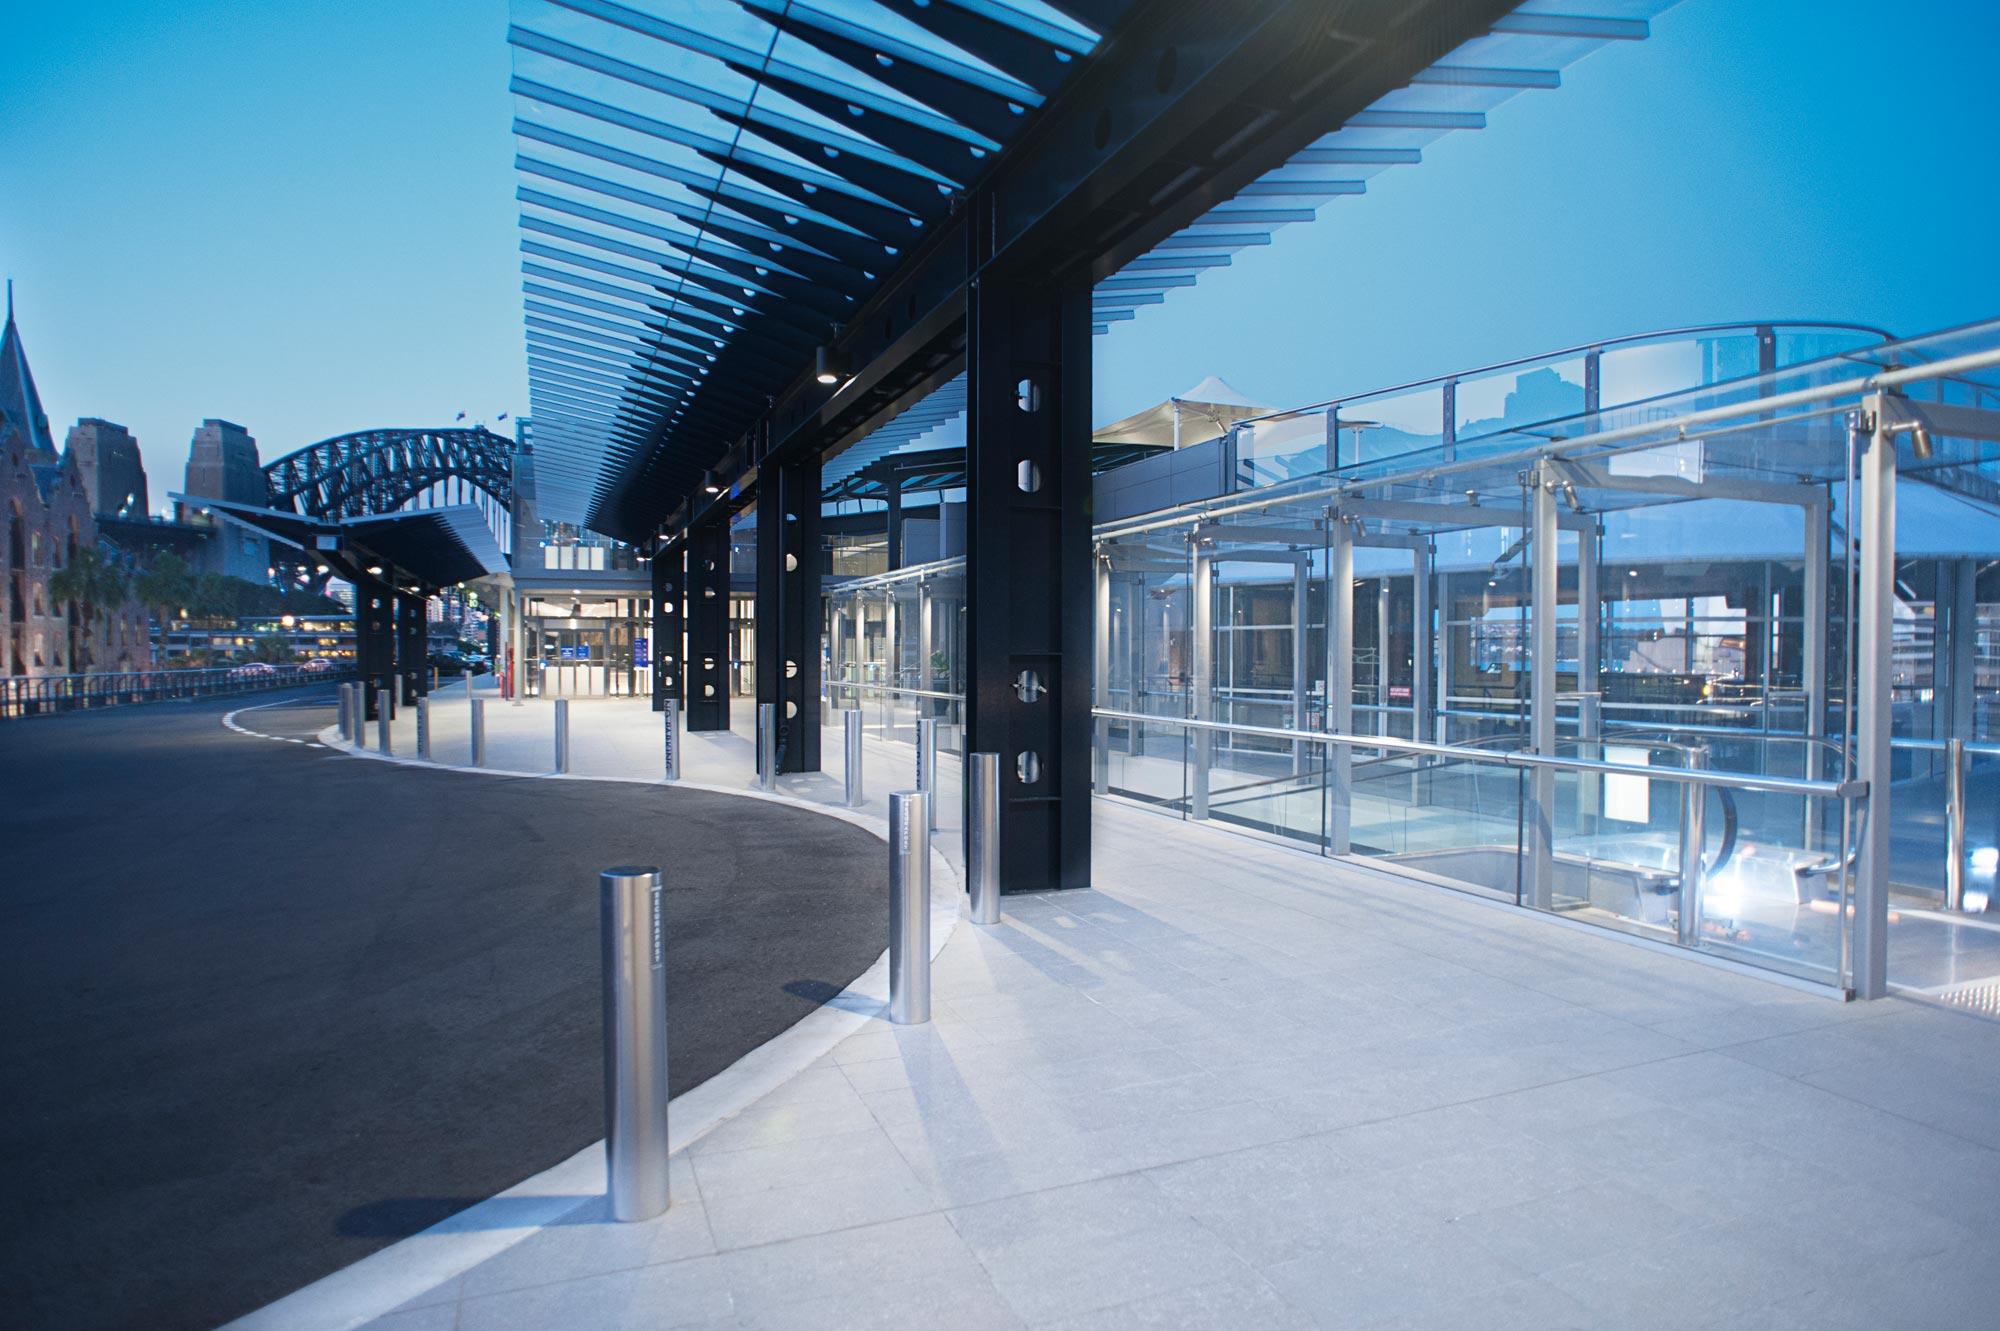 Overseas passenger terminal 00002